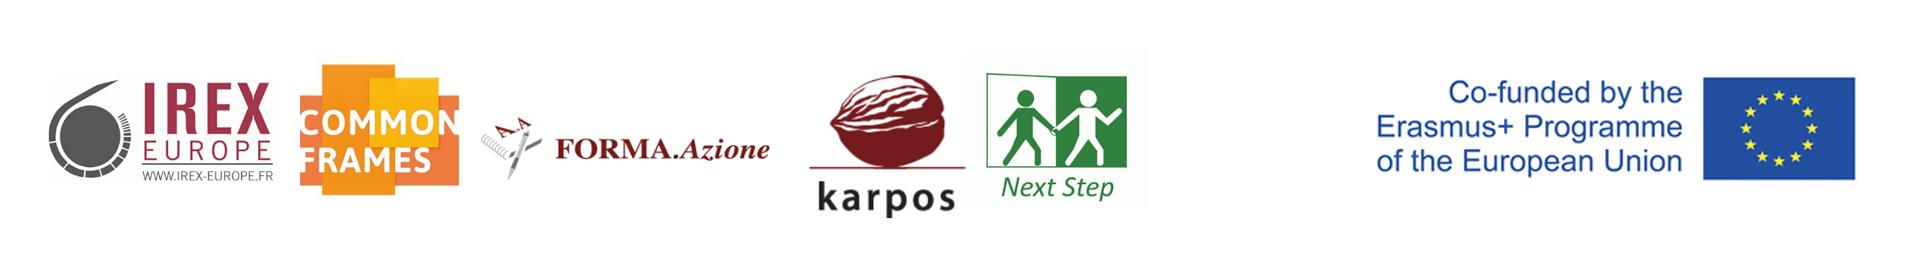 speakUp_logos